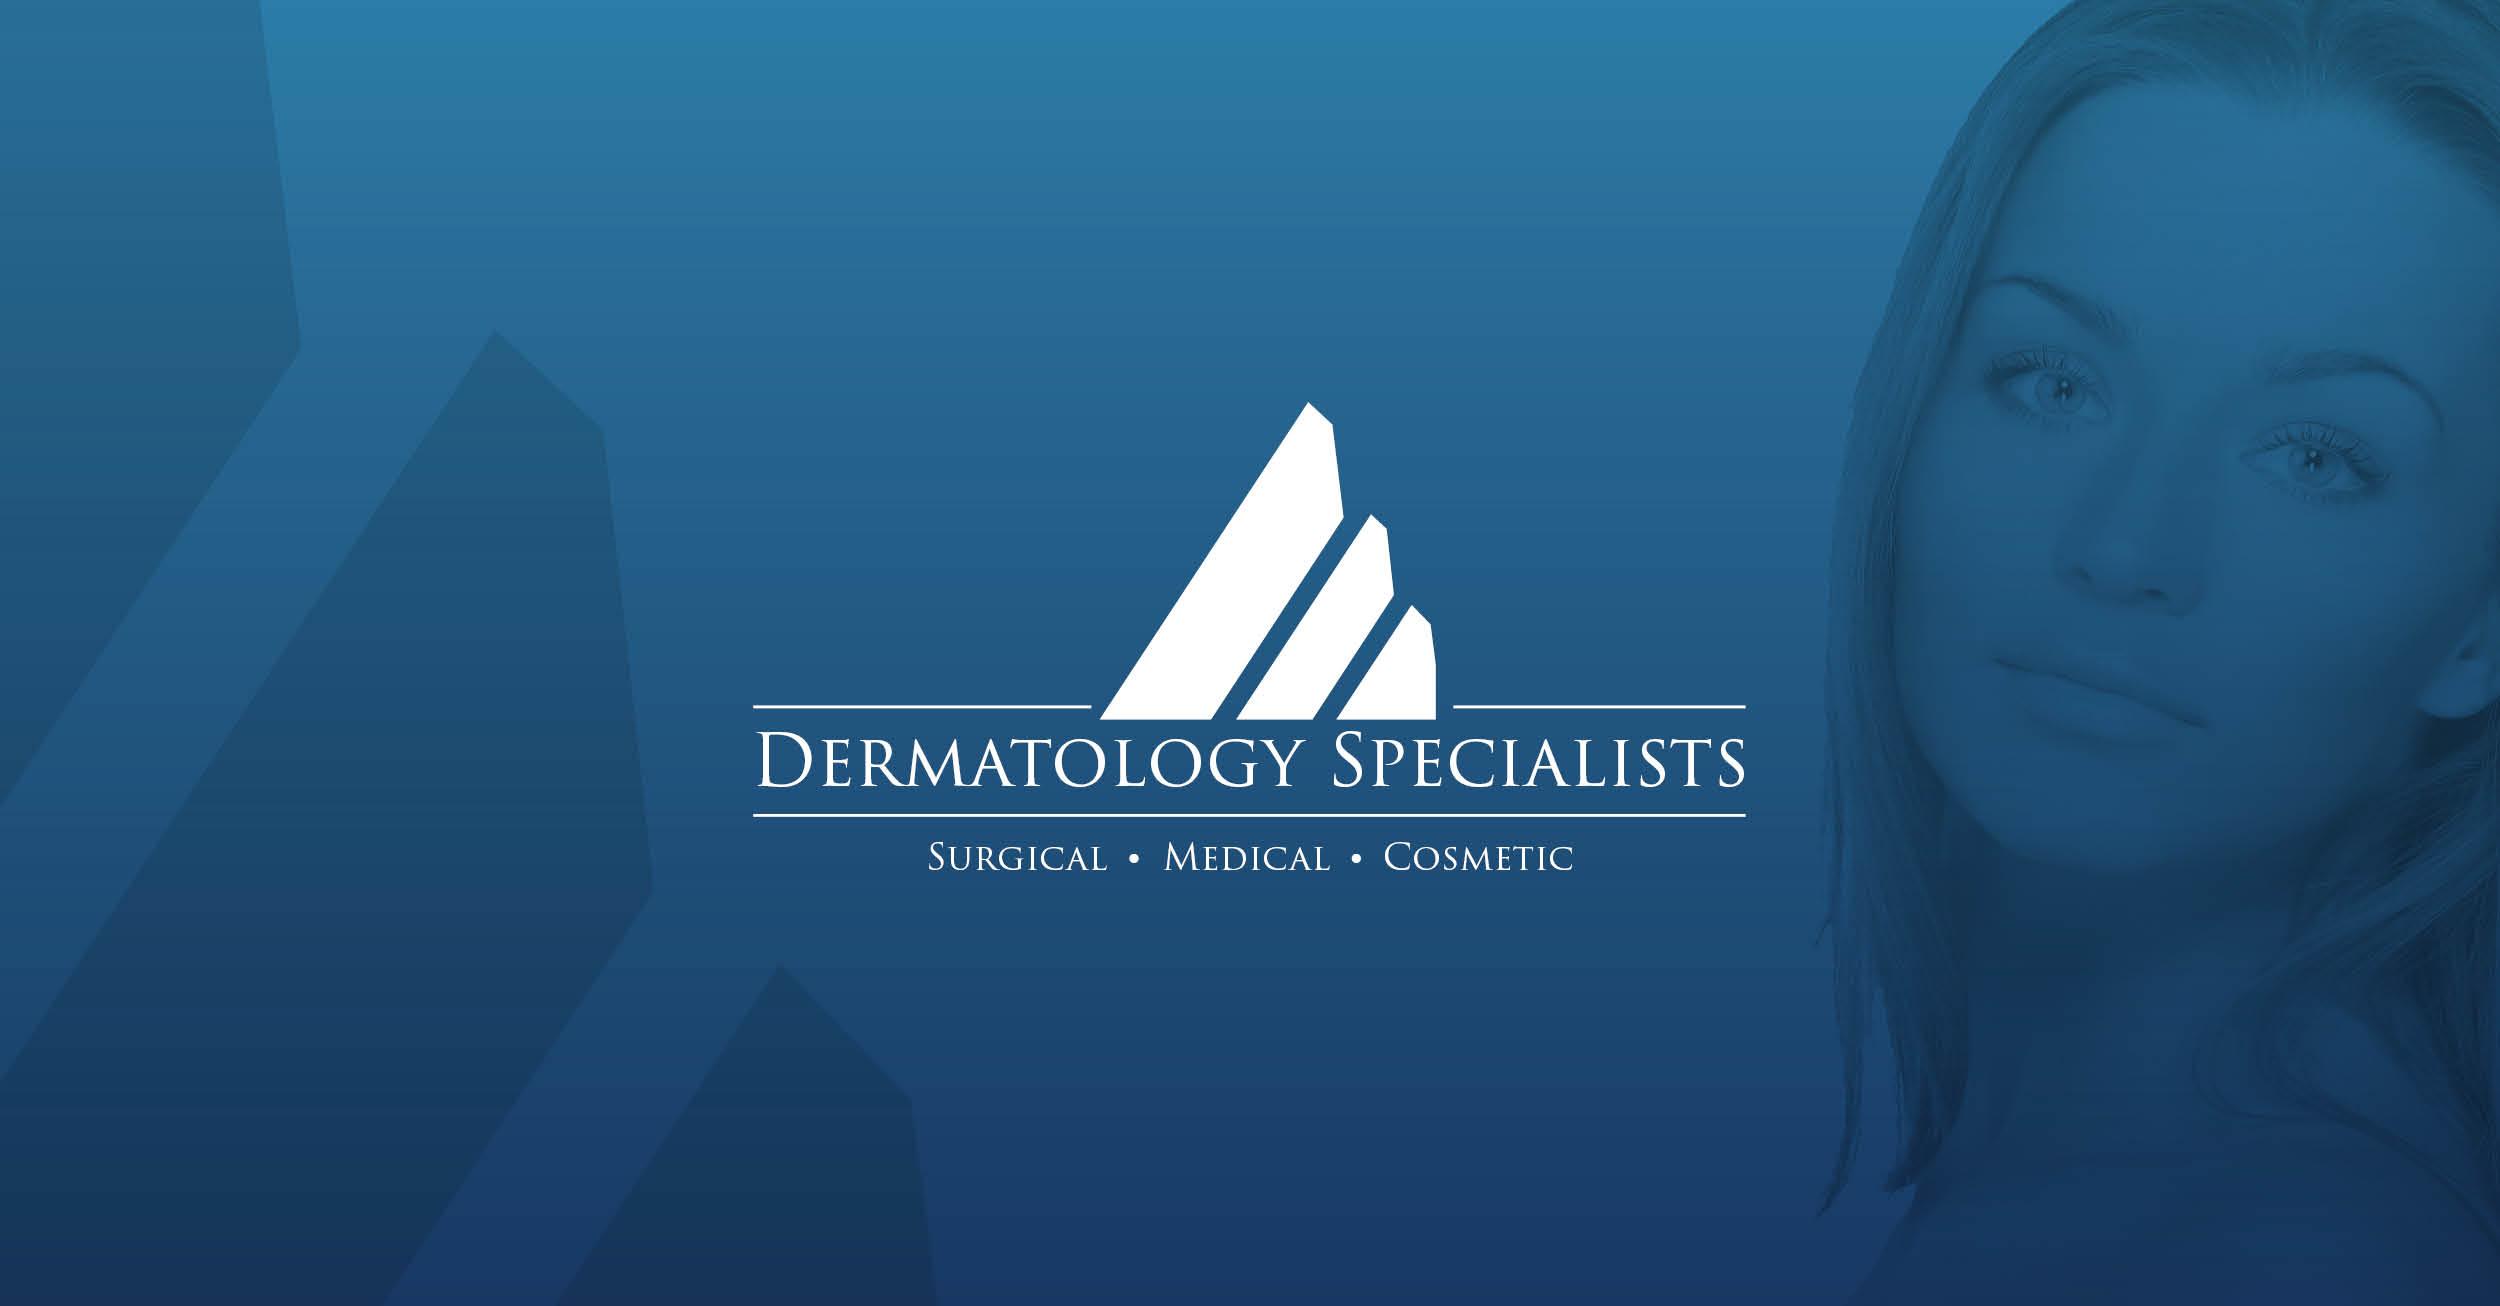 Dermatology Specialists | Dermatology Specialists Near Me | Colorado